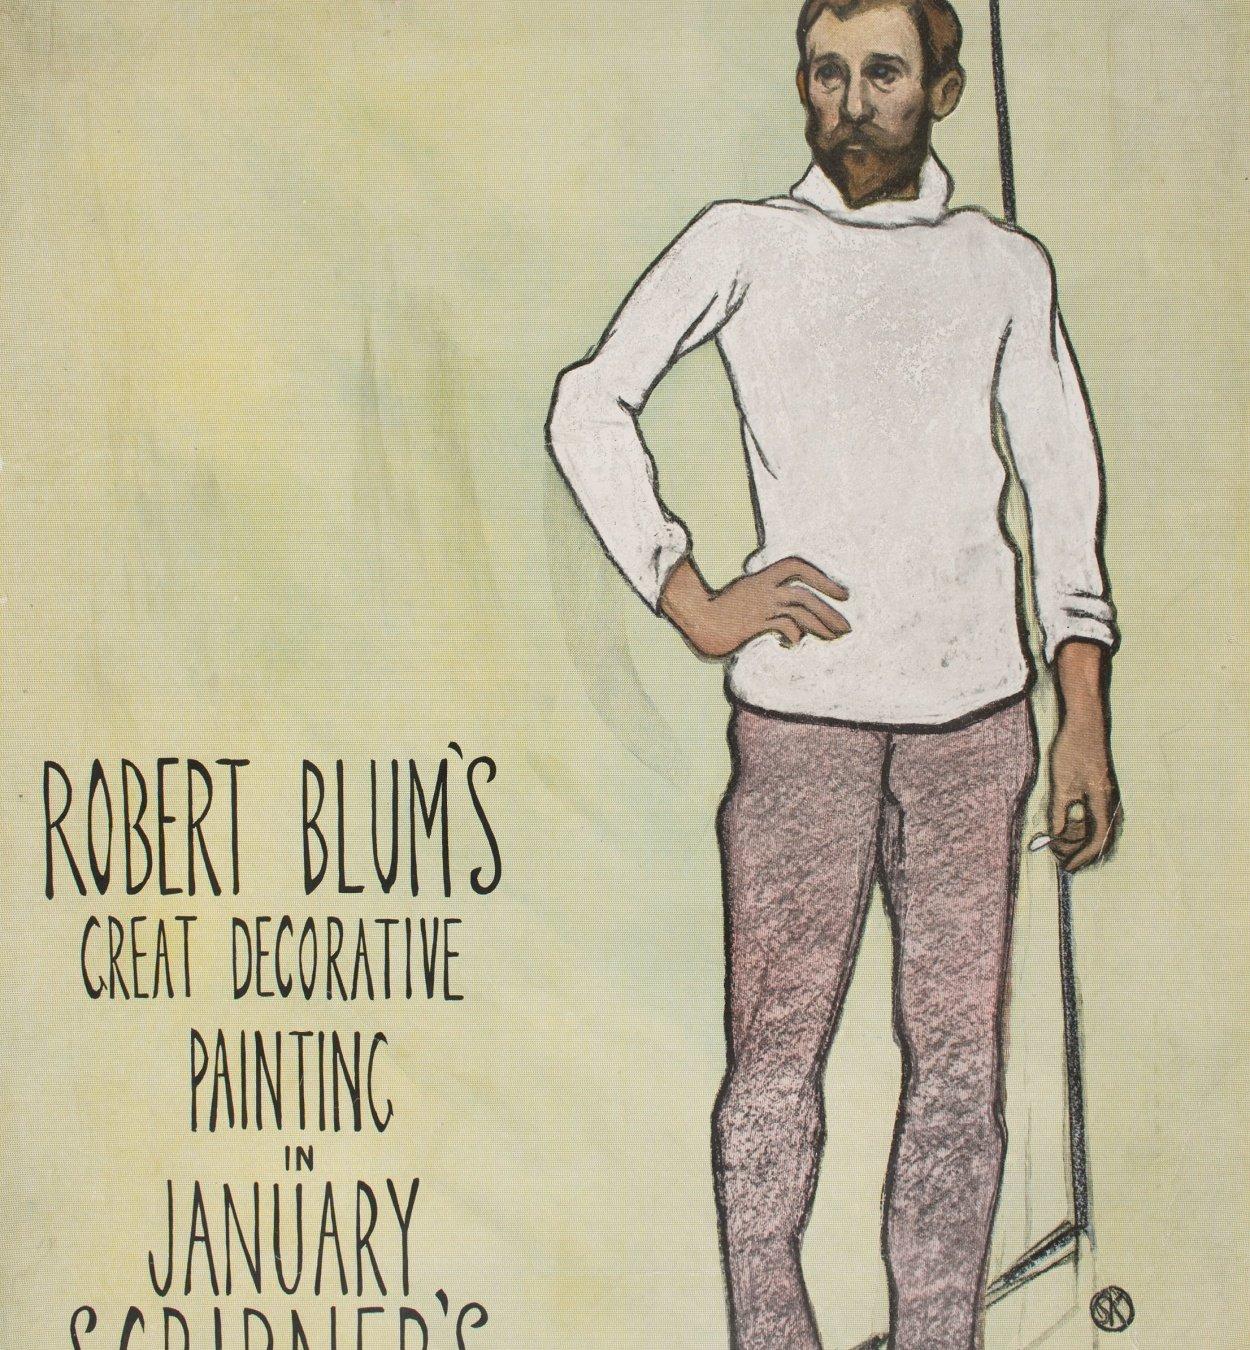 William Sergeant Kendall - Robert Blum's Great Decorative Painting in January Scribner's - Circa 1895-1896